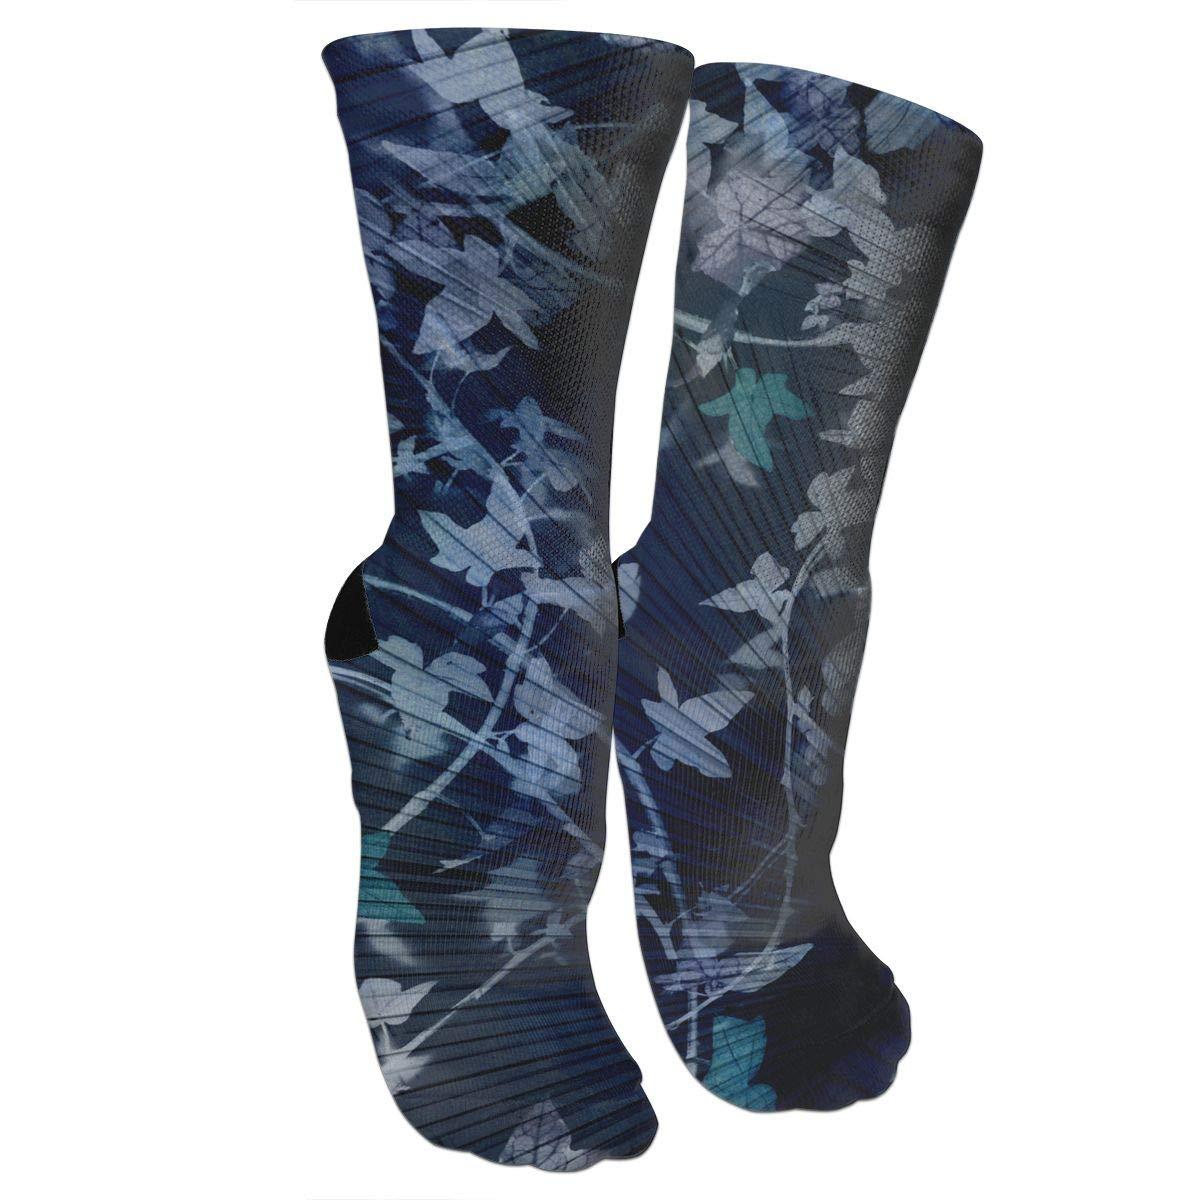 Leaf Illustrations Casual Socks Crew Socks Crazy Socks Soft Breathable For Sports Athletic Running